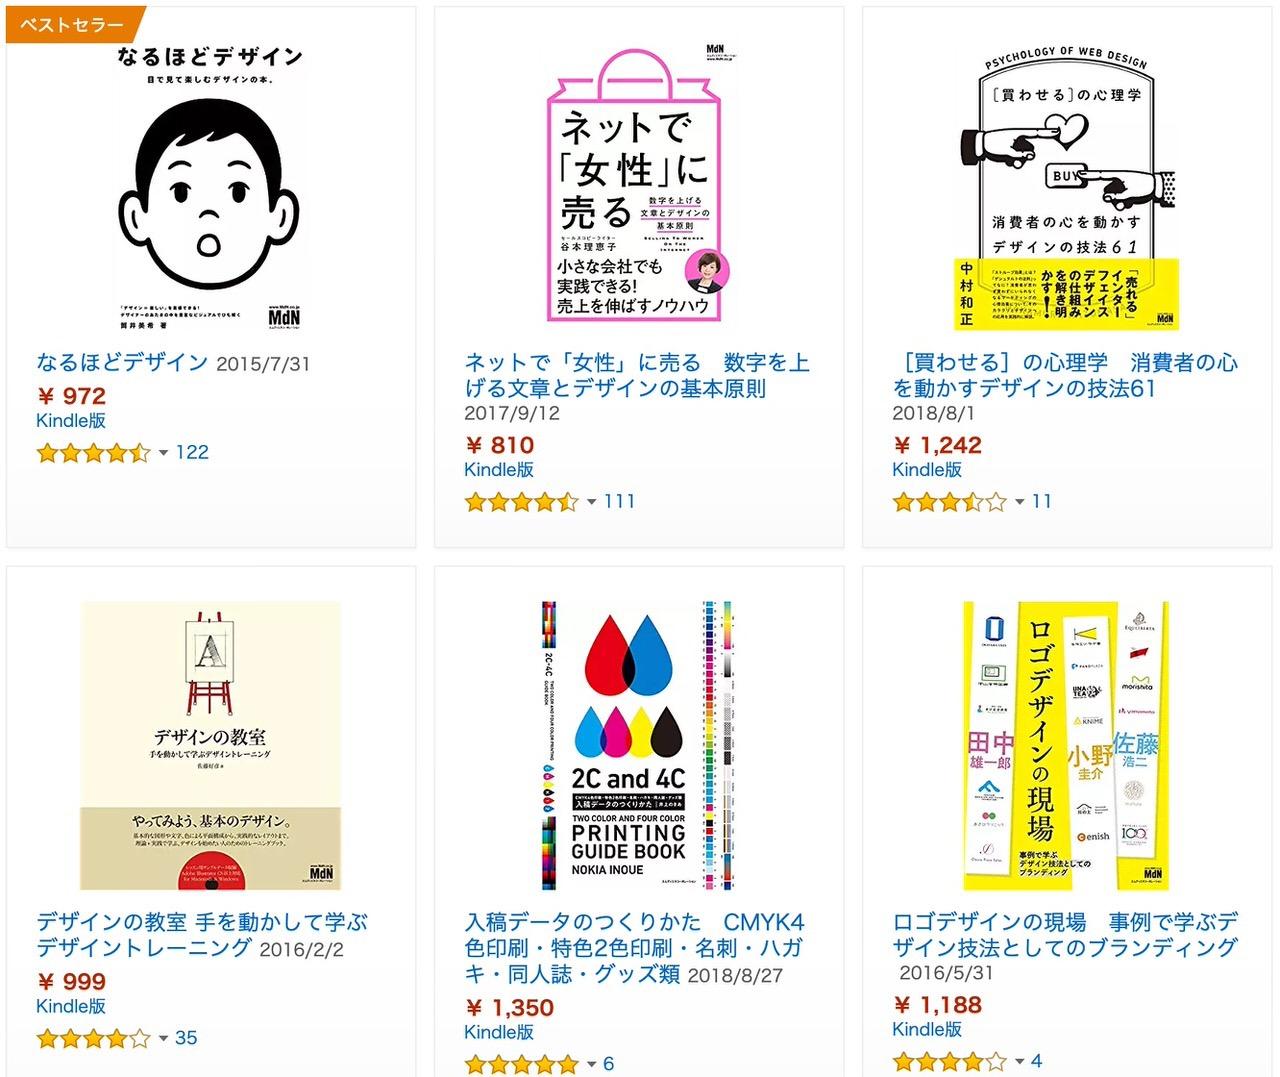 【Kindleセール】「なるほどデザイン」10万部突破記念!デザイン書フェア(3/31まで)